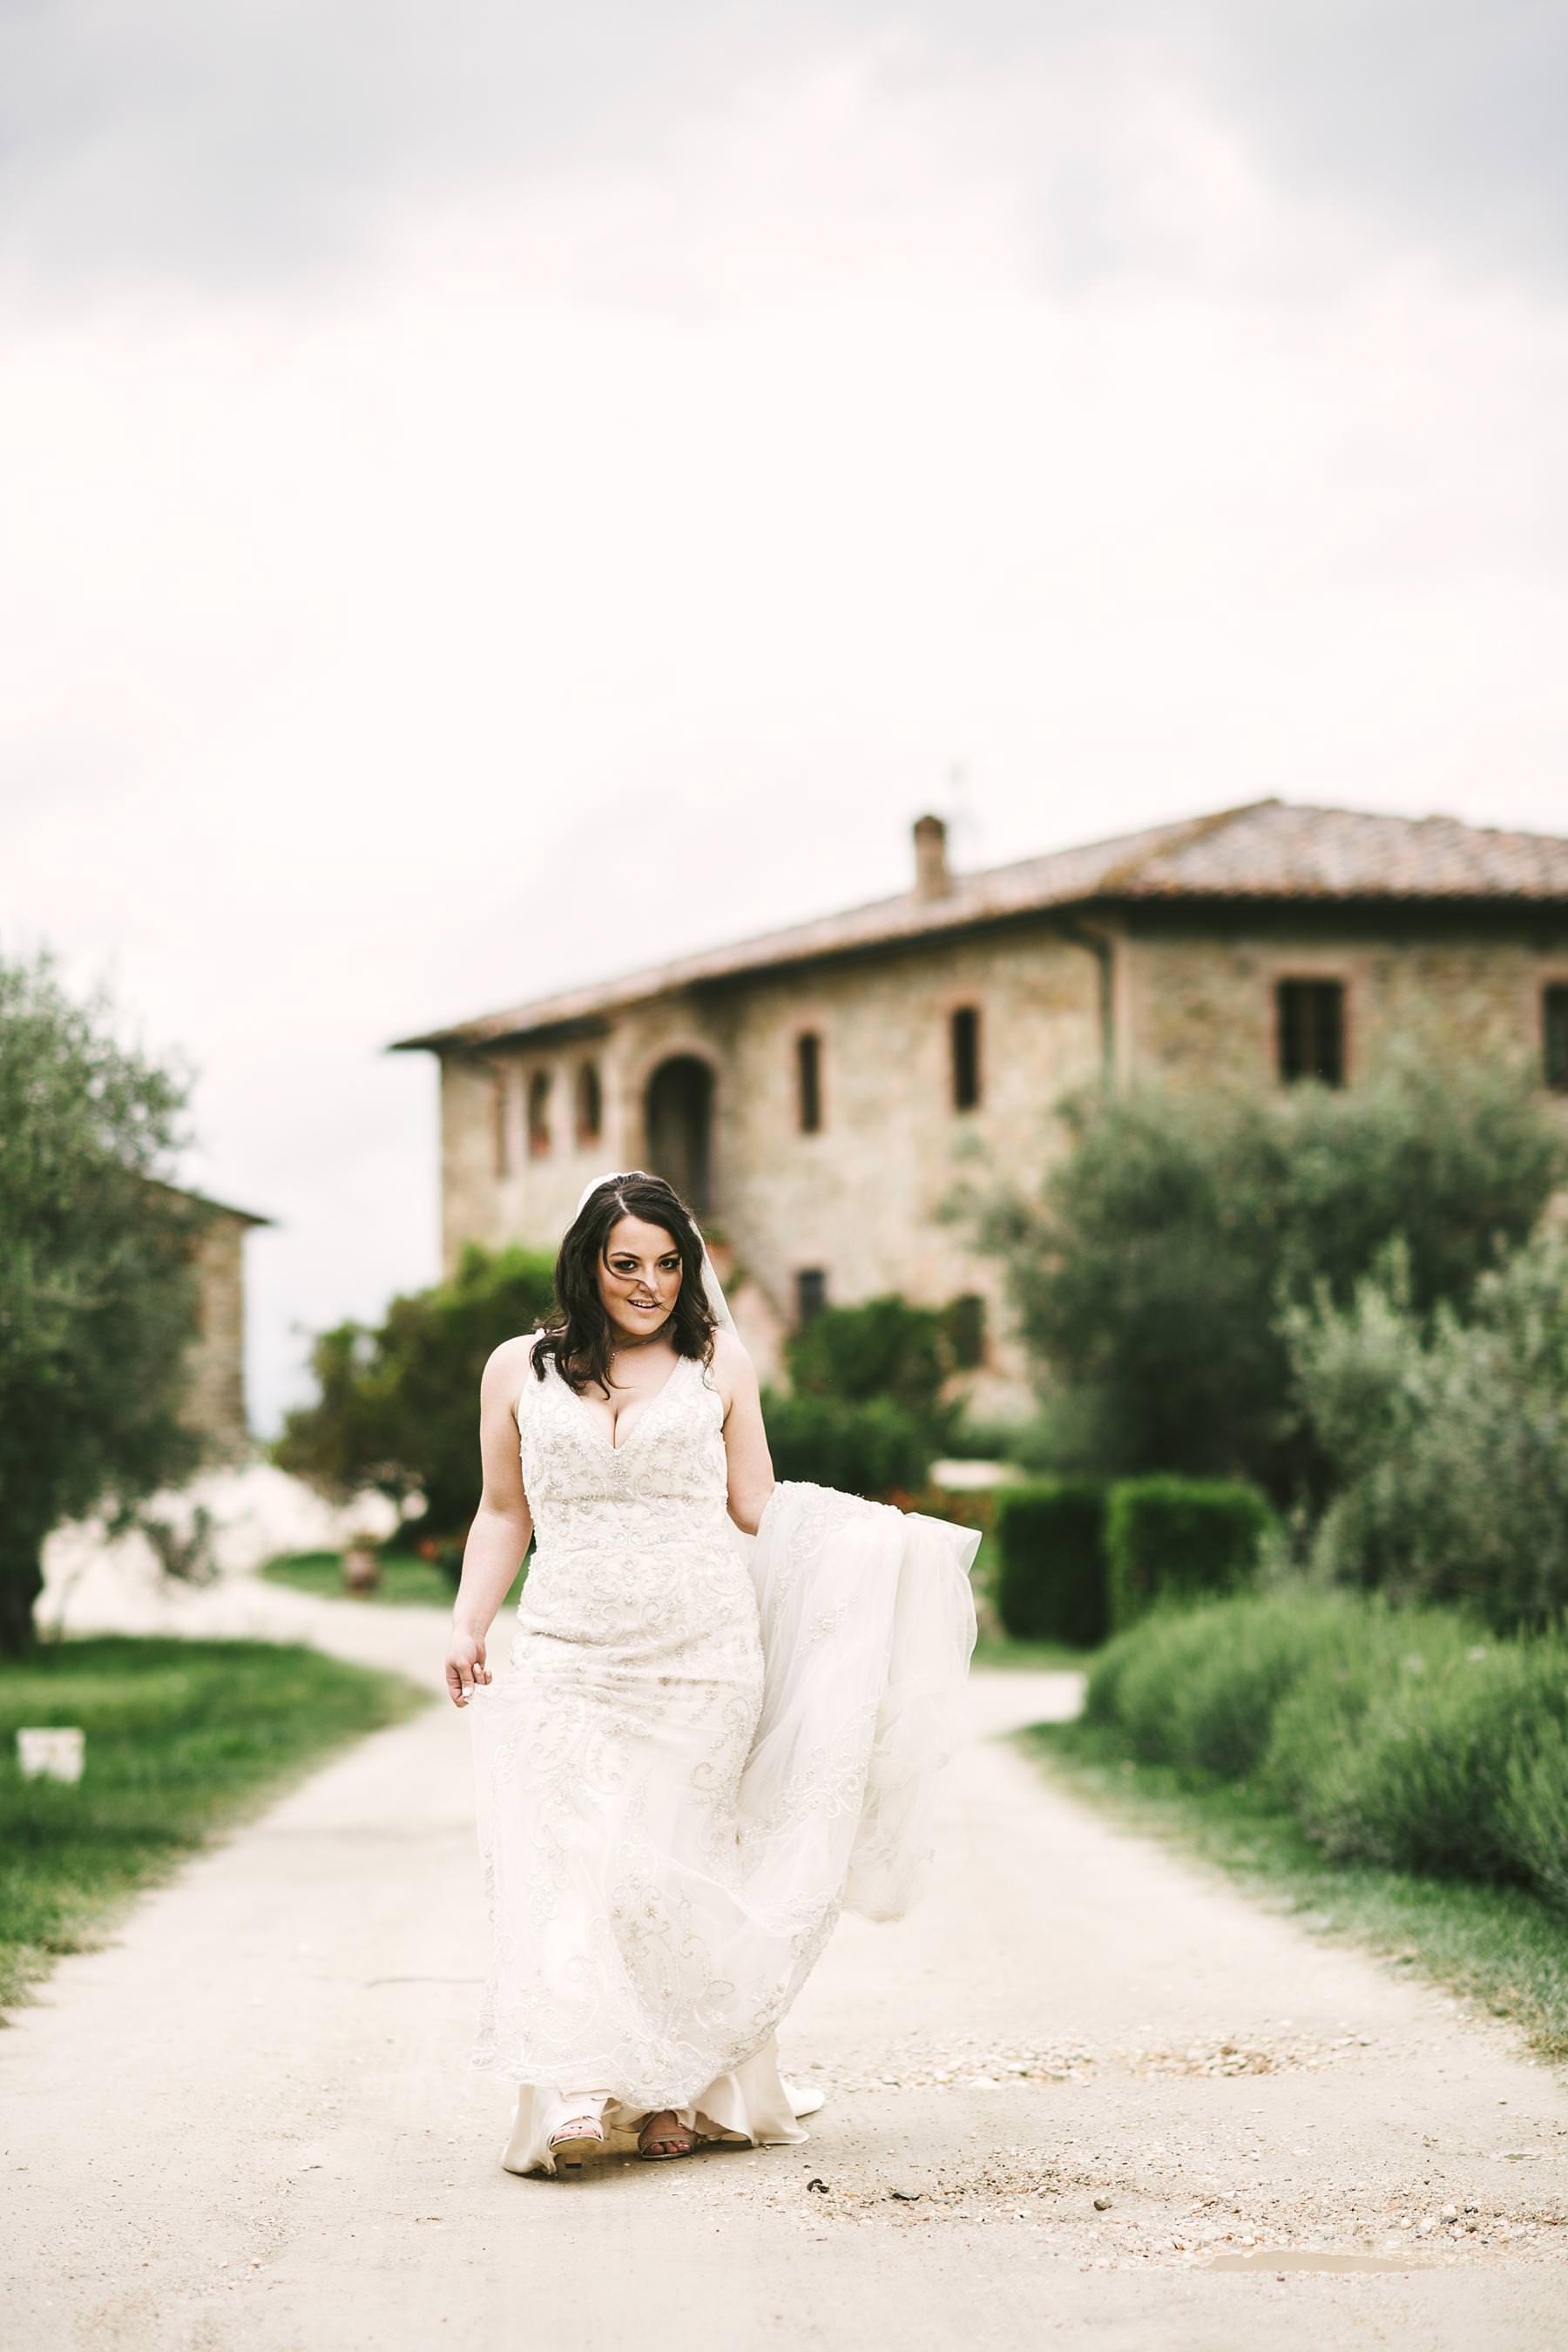 Lovely bridal portrait in Tuscany countryside venue of Villa Le Bolli near Radicondoli historic town